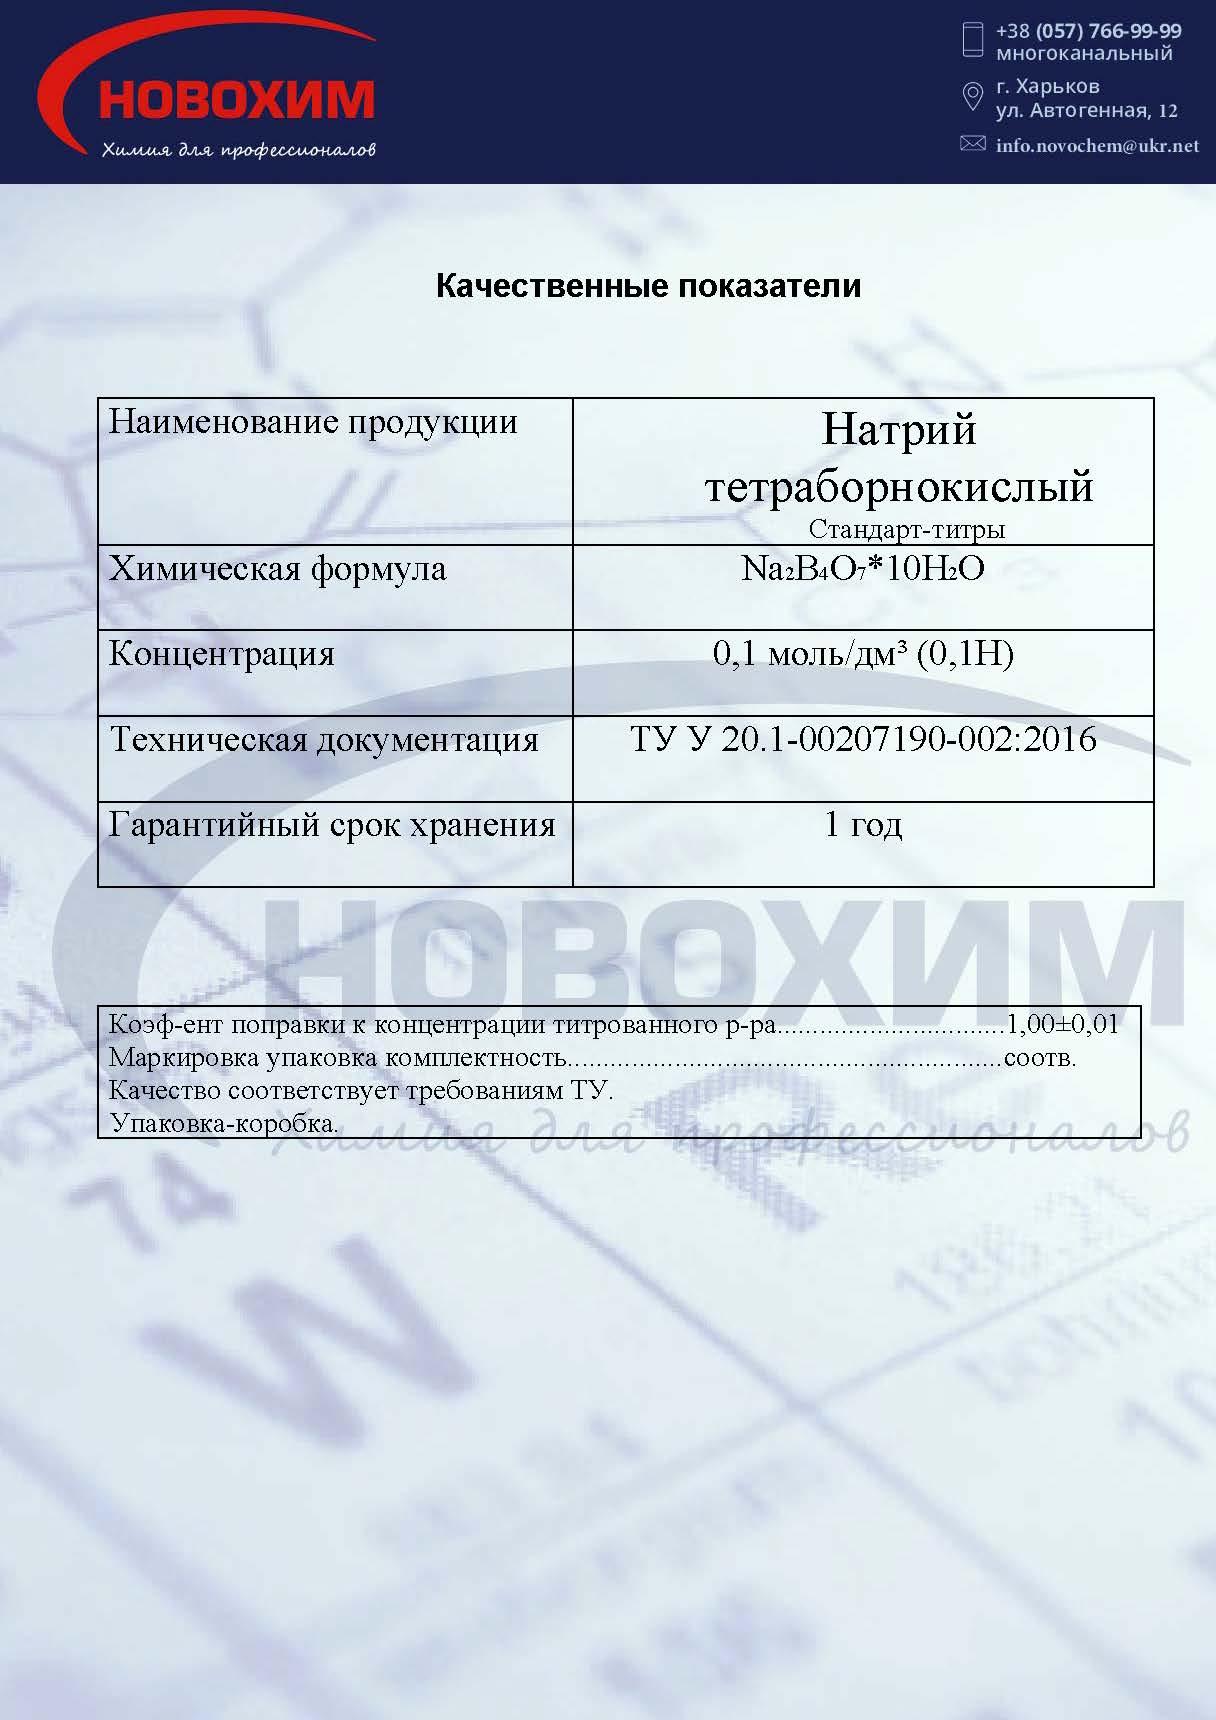 Натрий тетраборат